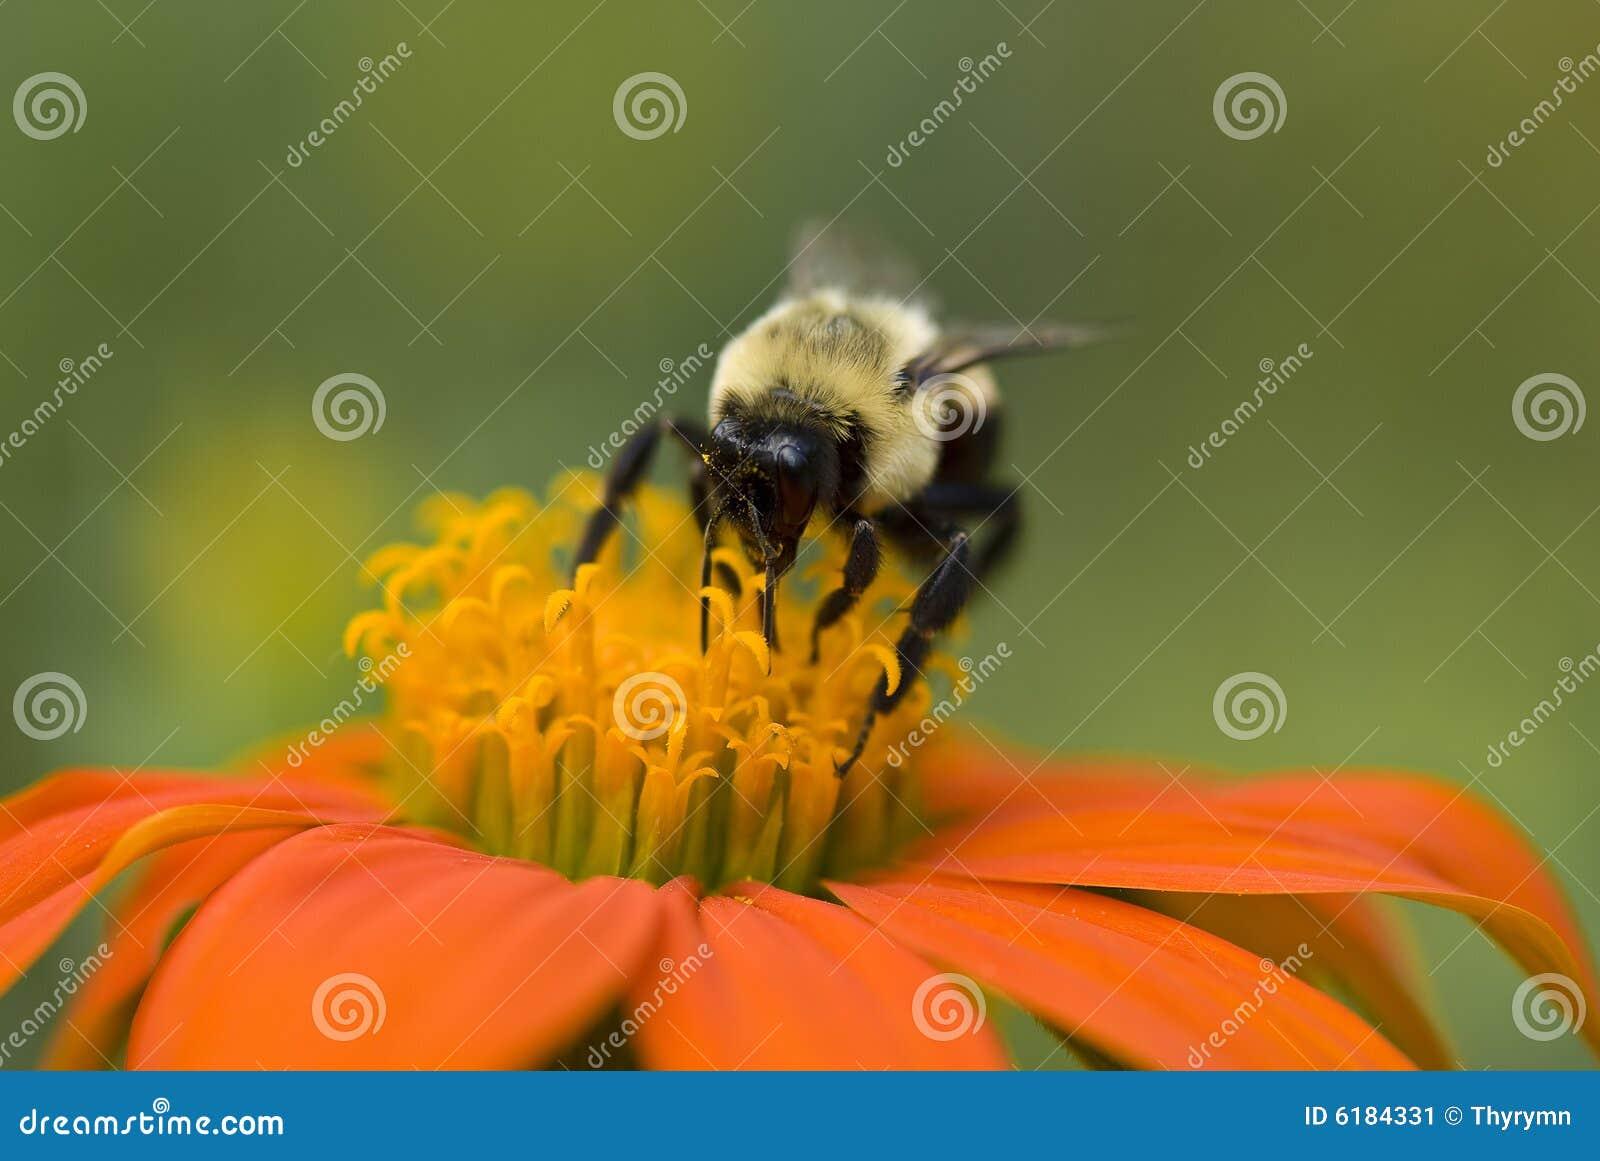 A macro of a bumble bee